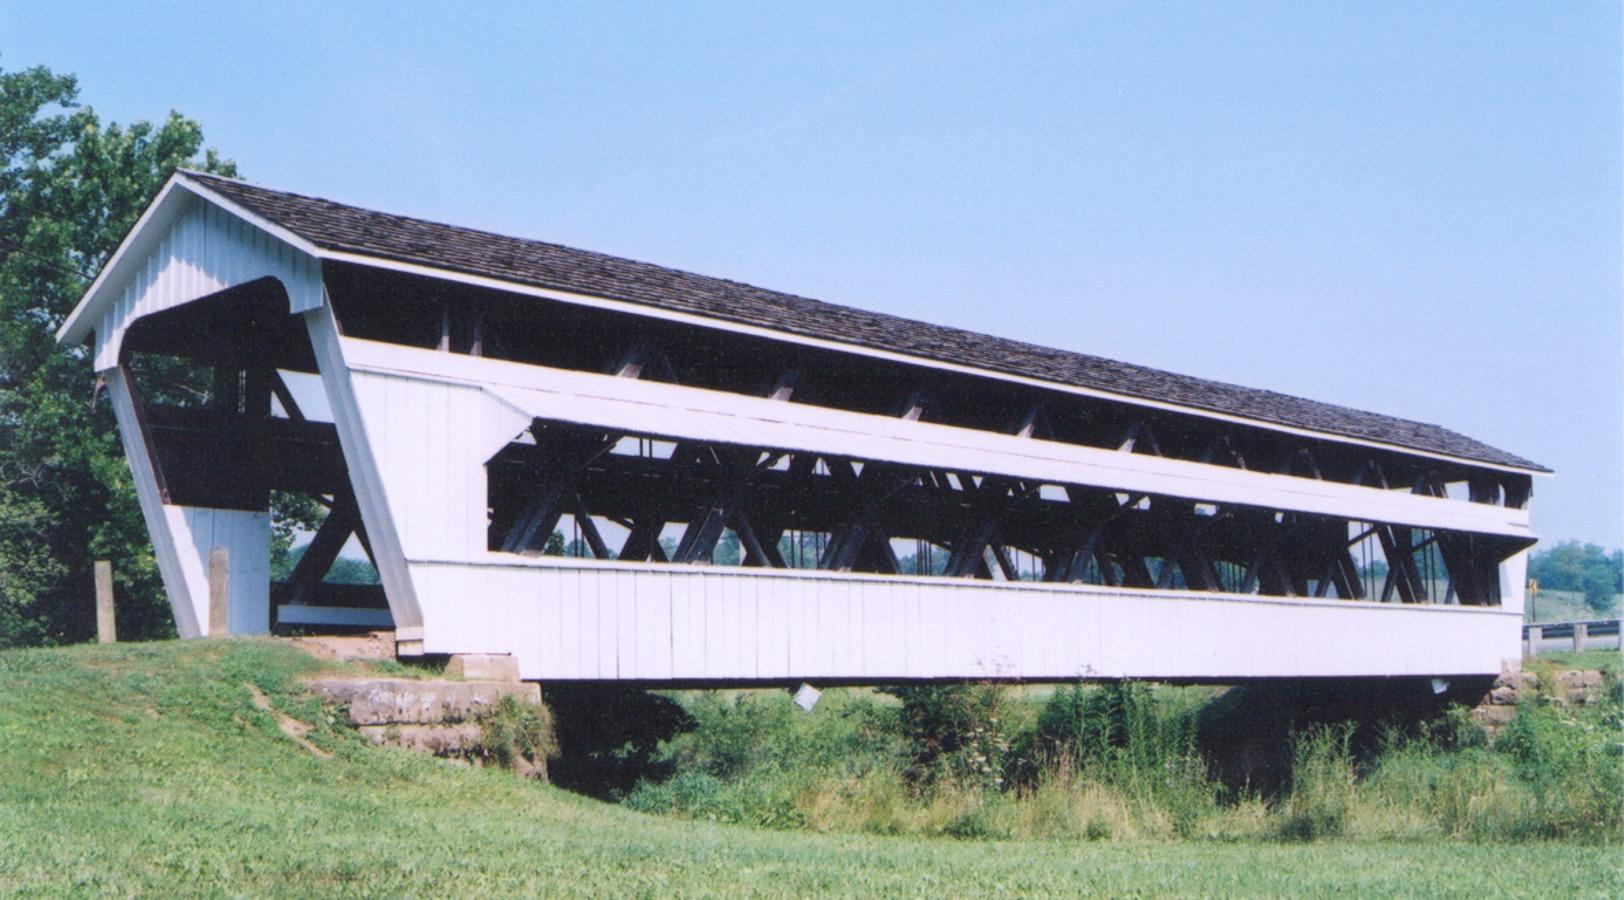 Clear Creek Metro Park In The Hocking Hills Region Of Ohio